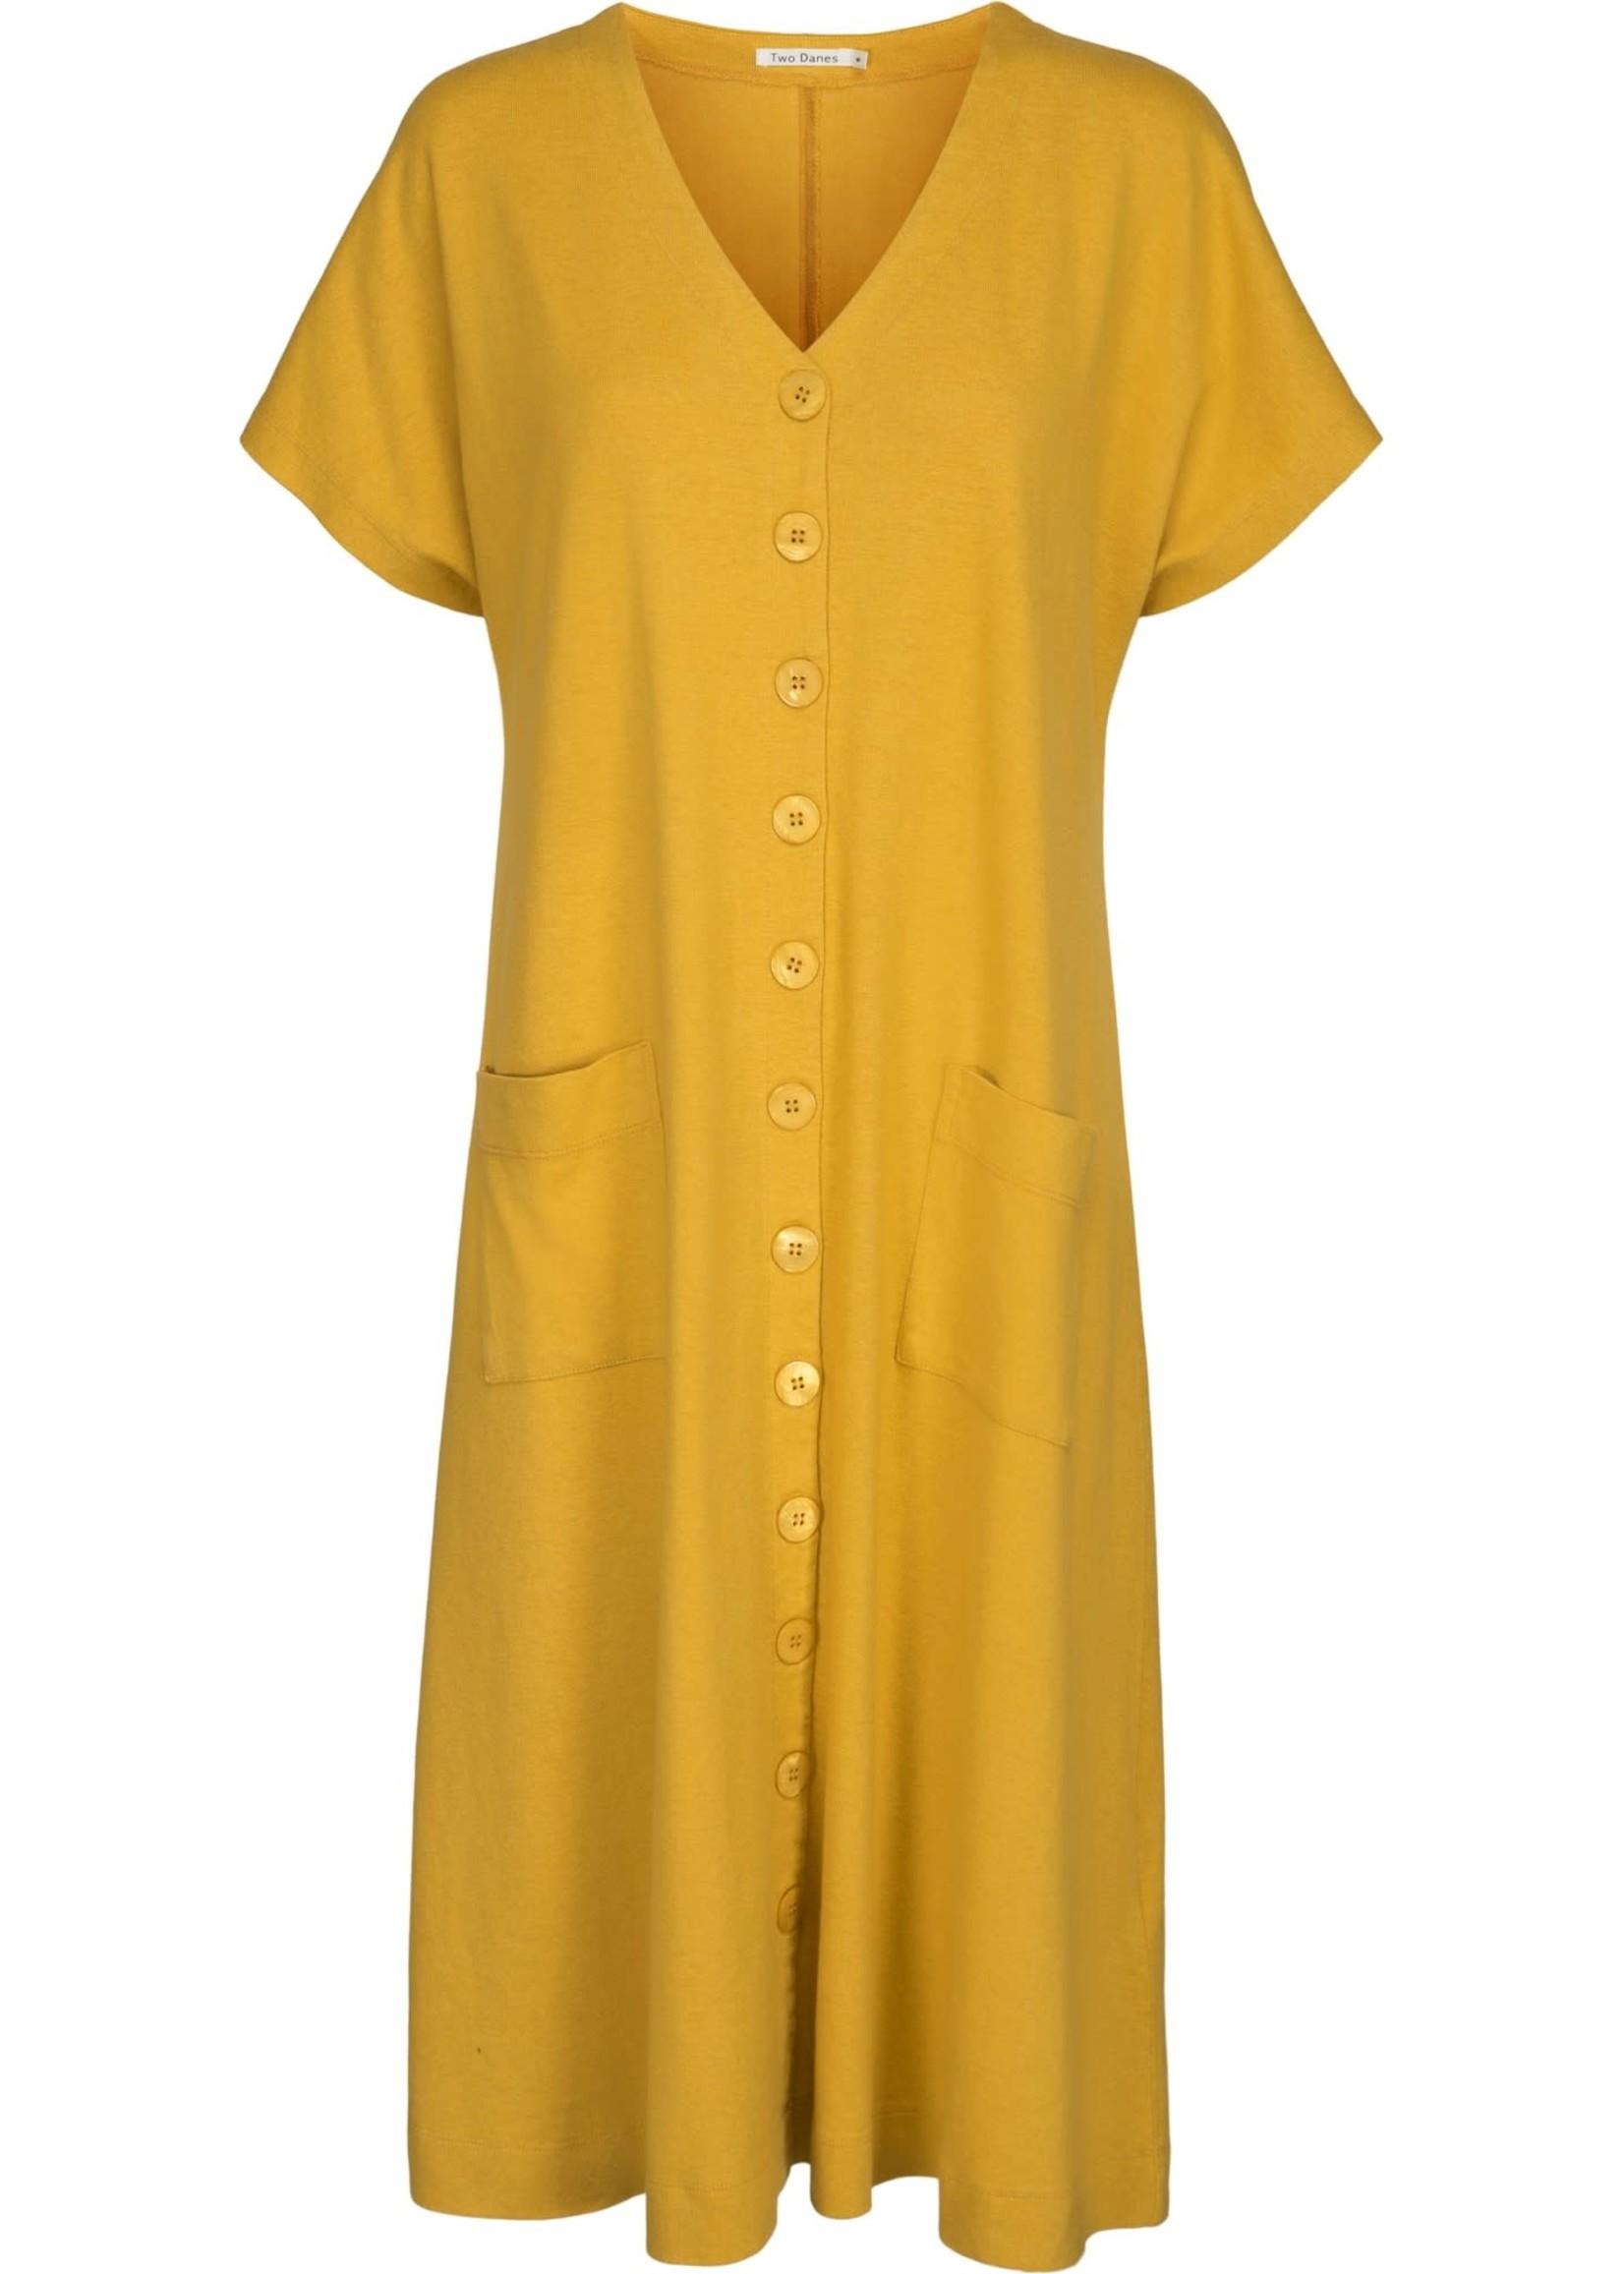 TWO DANES 33021 325 honey  dress